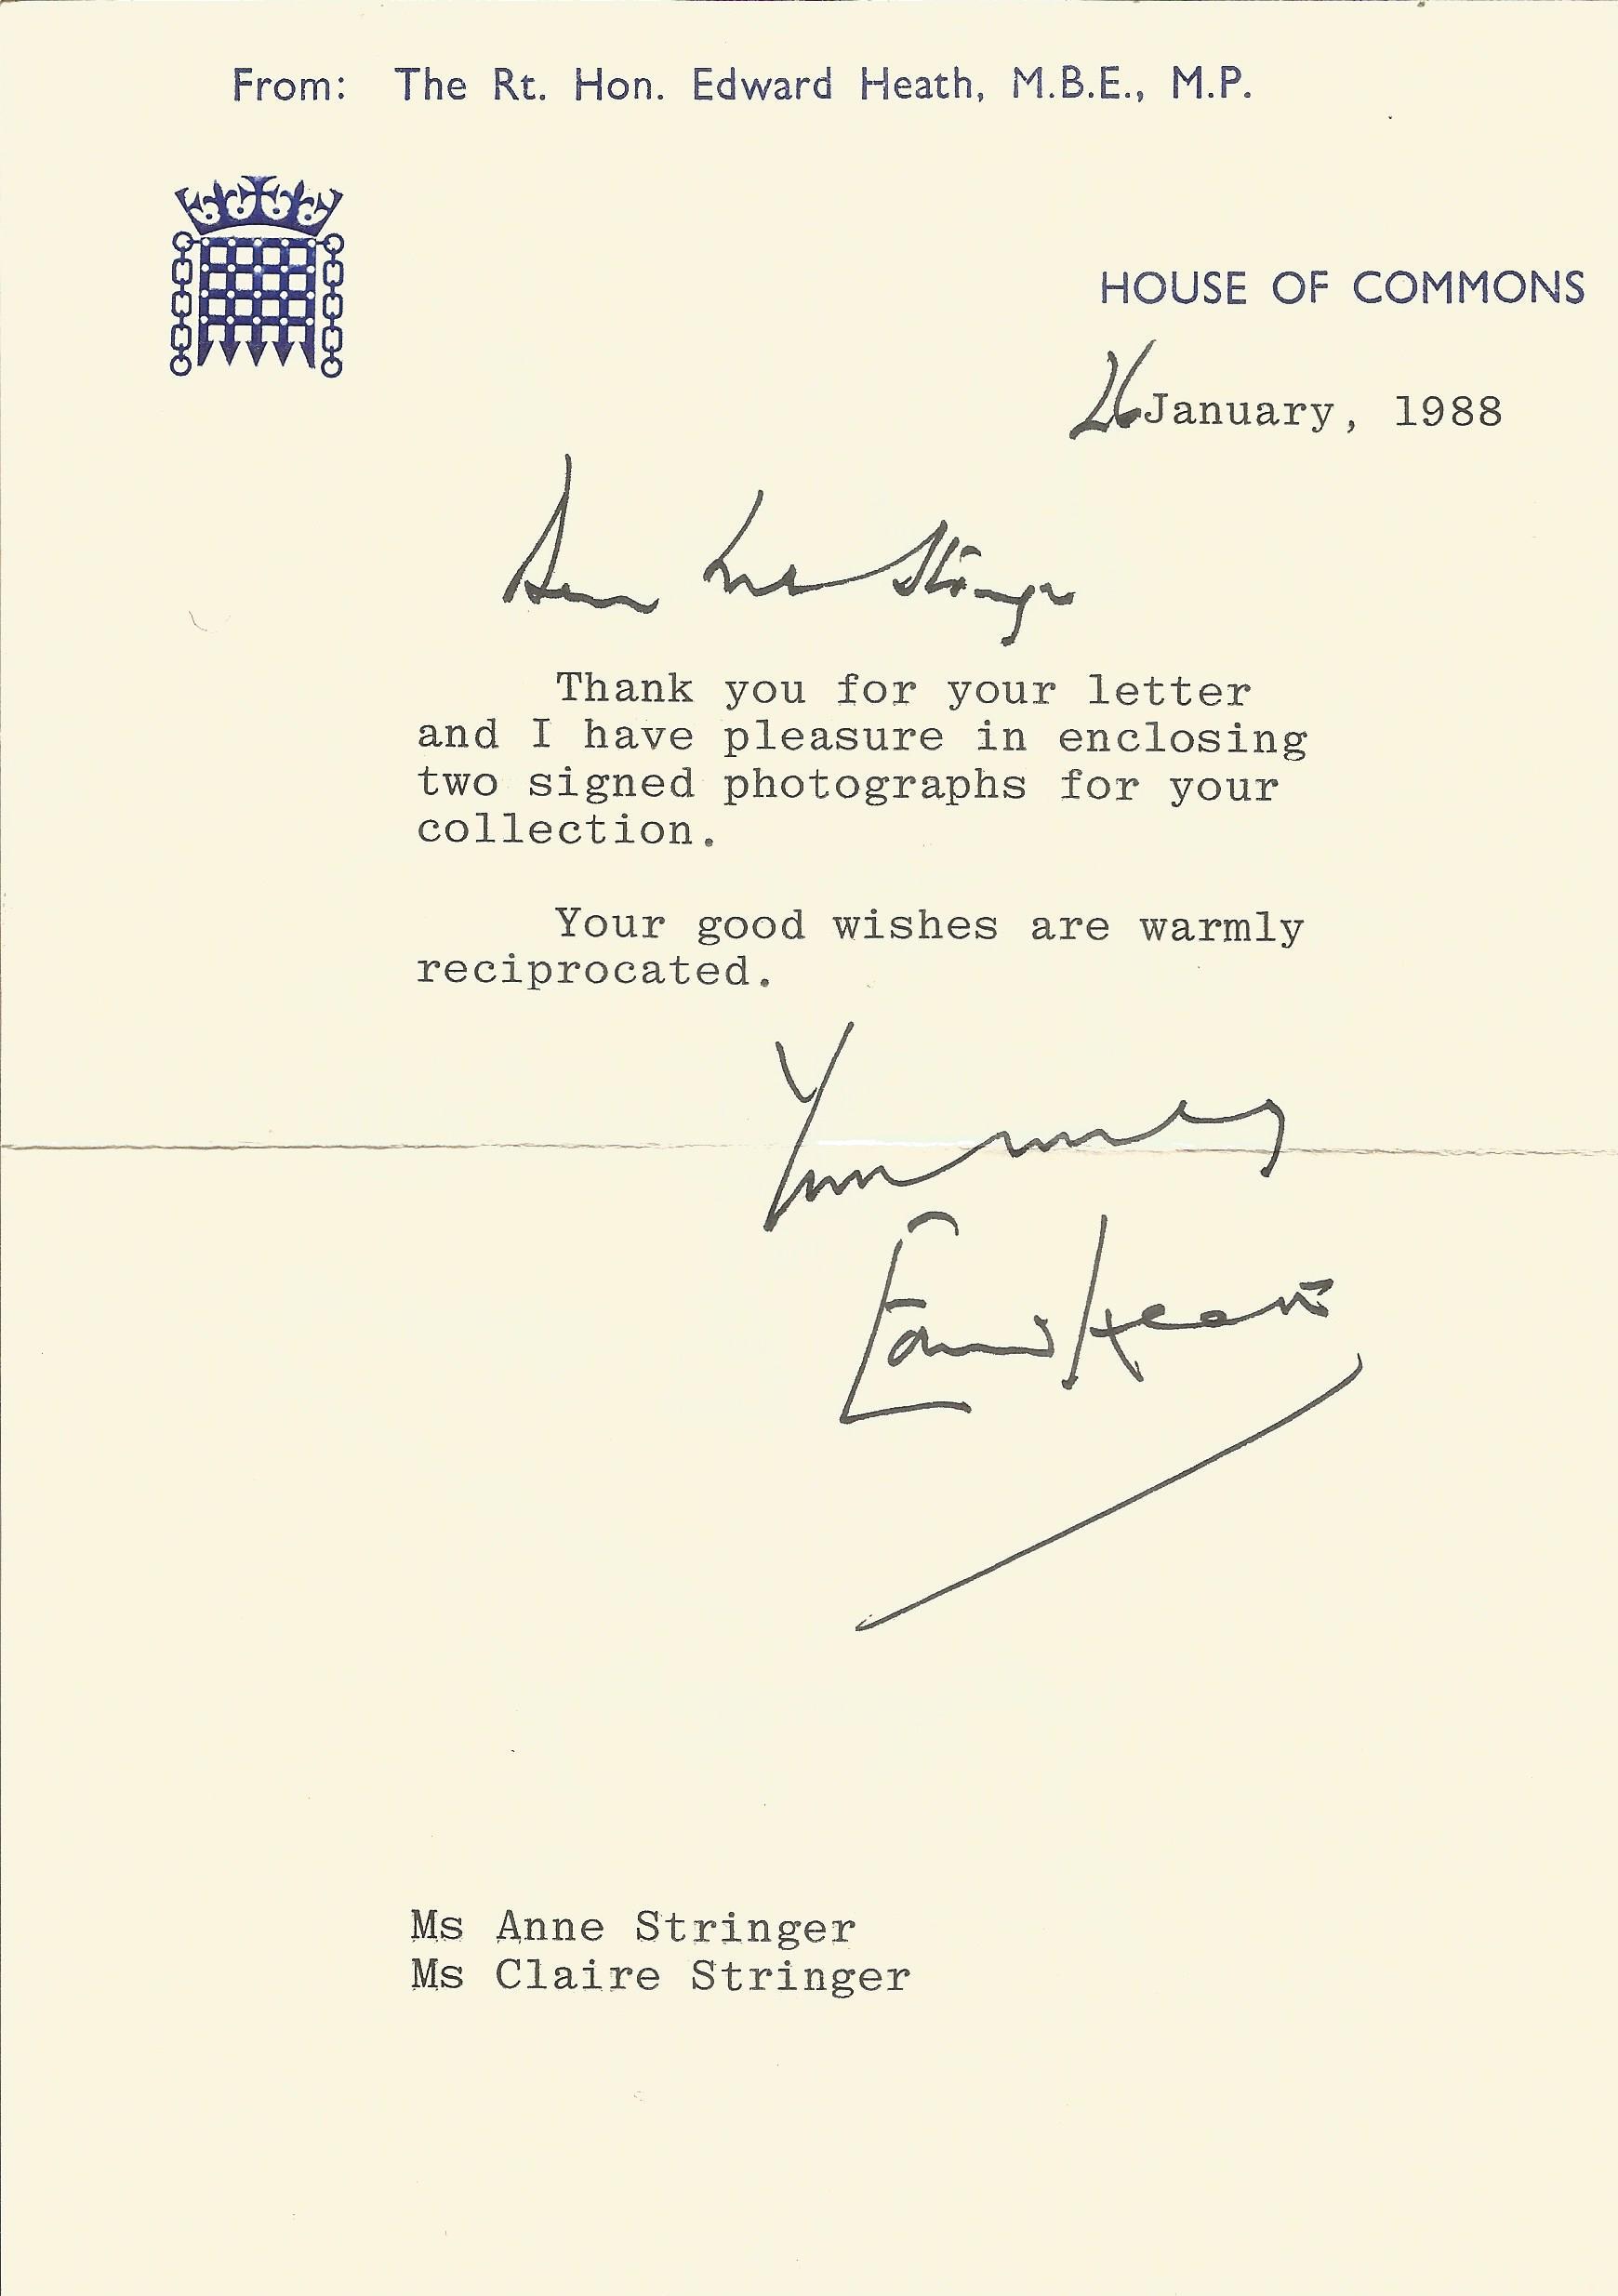 Edward Heath TLS dated 26th January 1988. Heath was a British politician who served as Prime